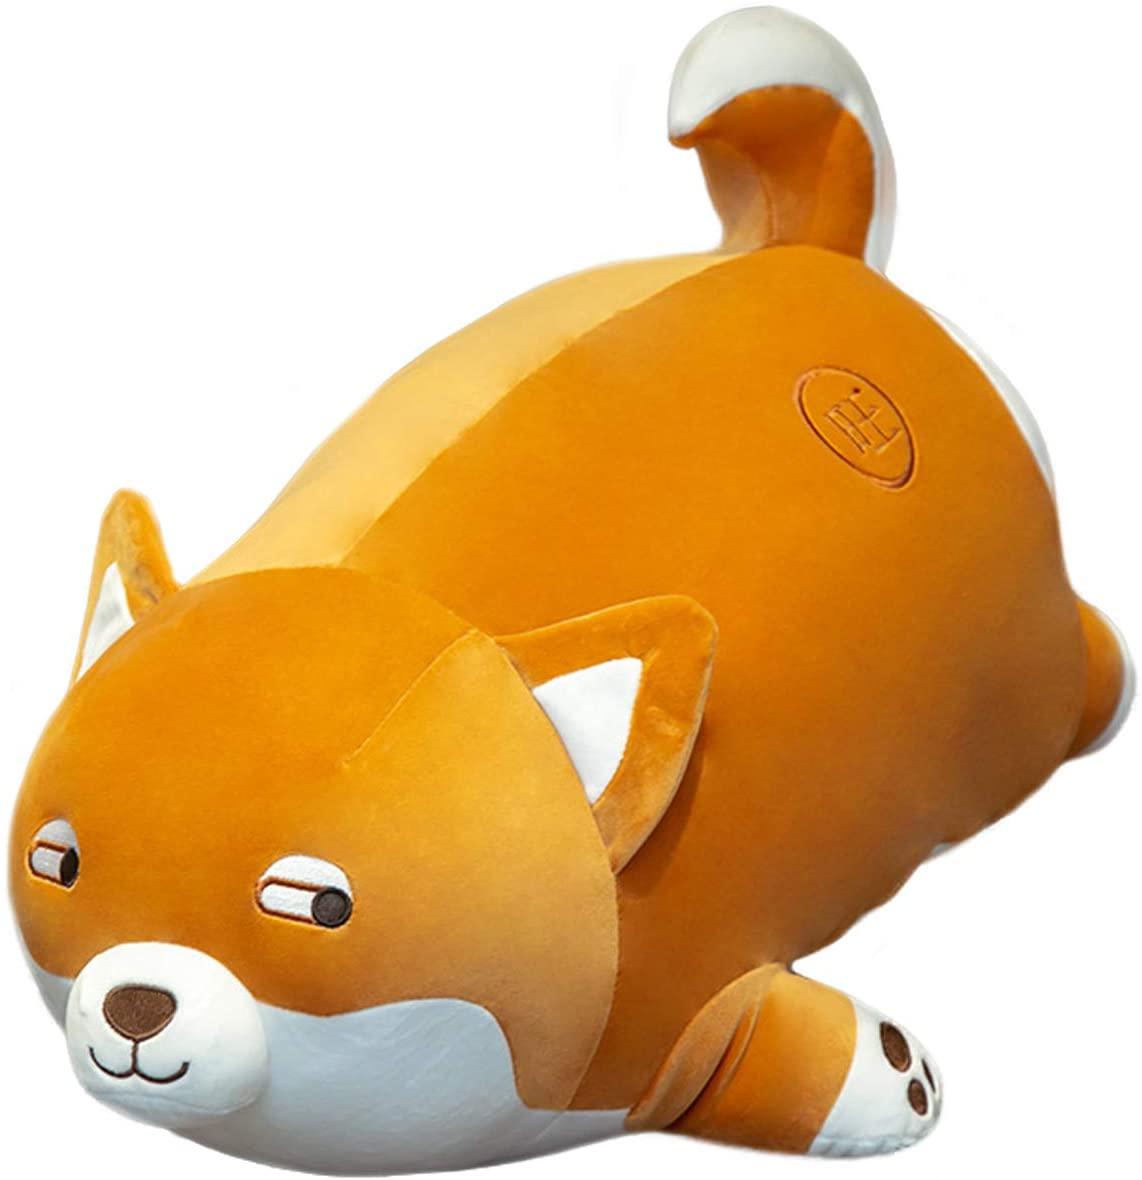 ELAINREN Fat Shiba Inu Dog Stuffed Animal Puppy Toy, 23.6Inch Corgi & Akita Dog Plush Soft Hugging Pillow Decor Gifts for Boys Girls Xmas Birthday/Brown